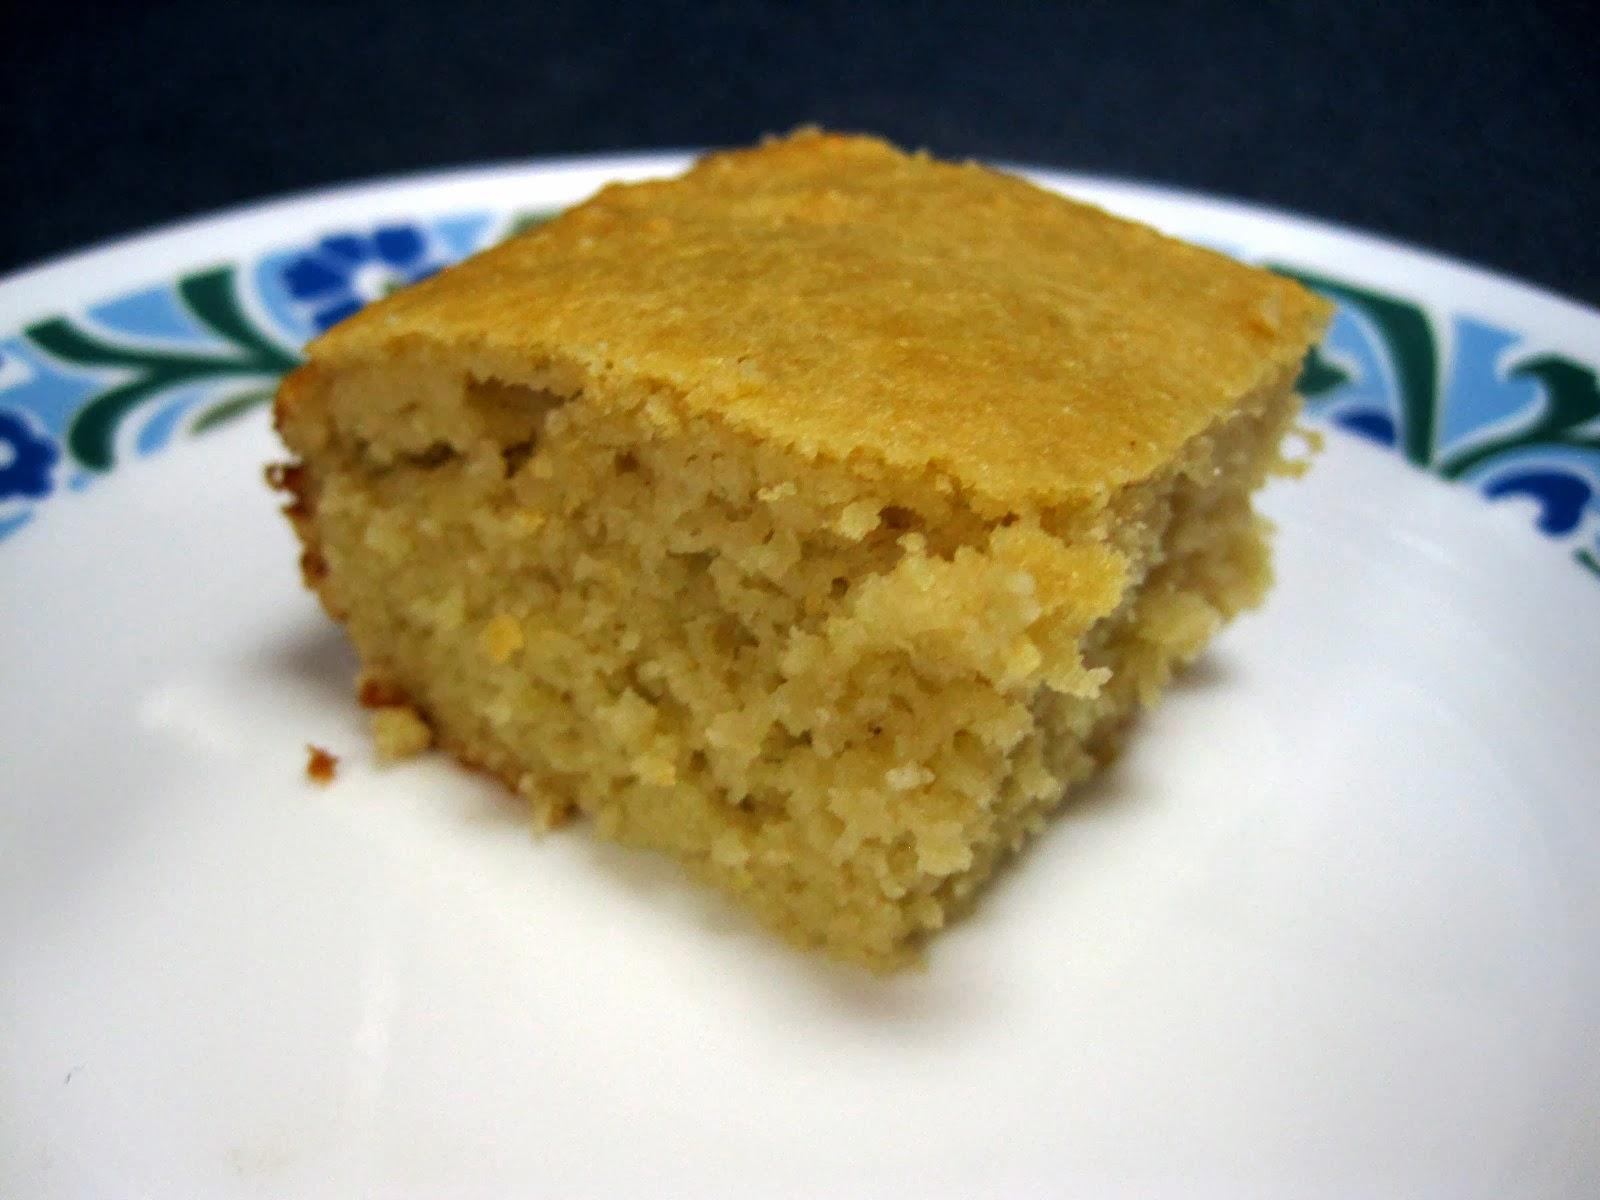 grain free cornbread gluten free Paleo